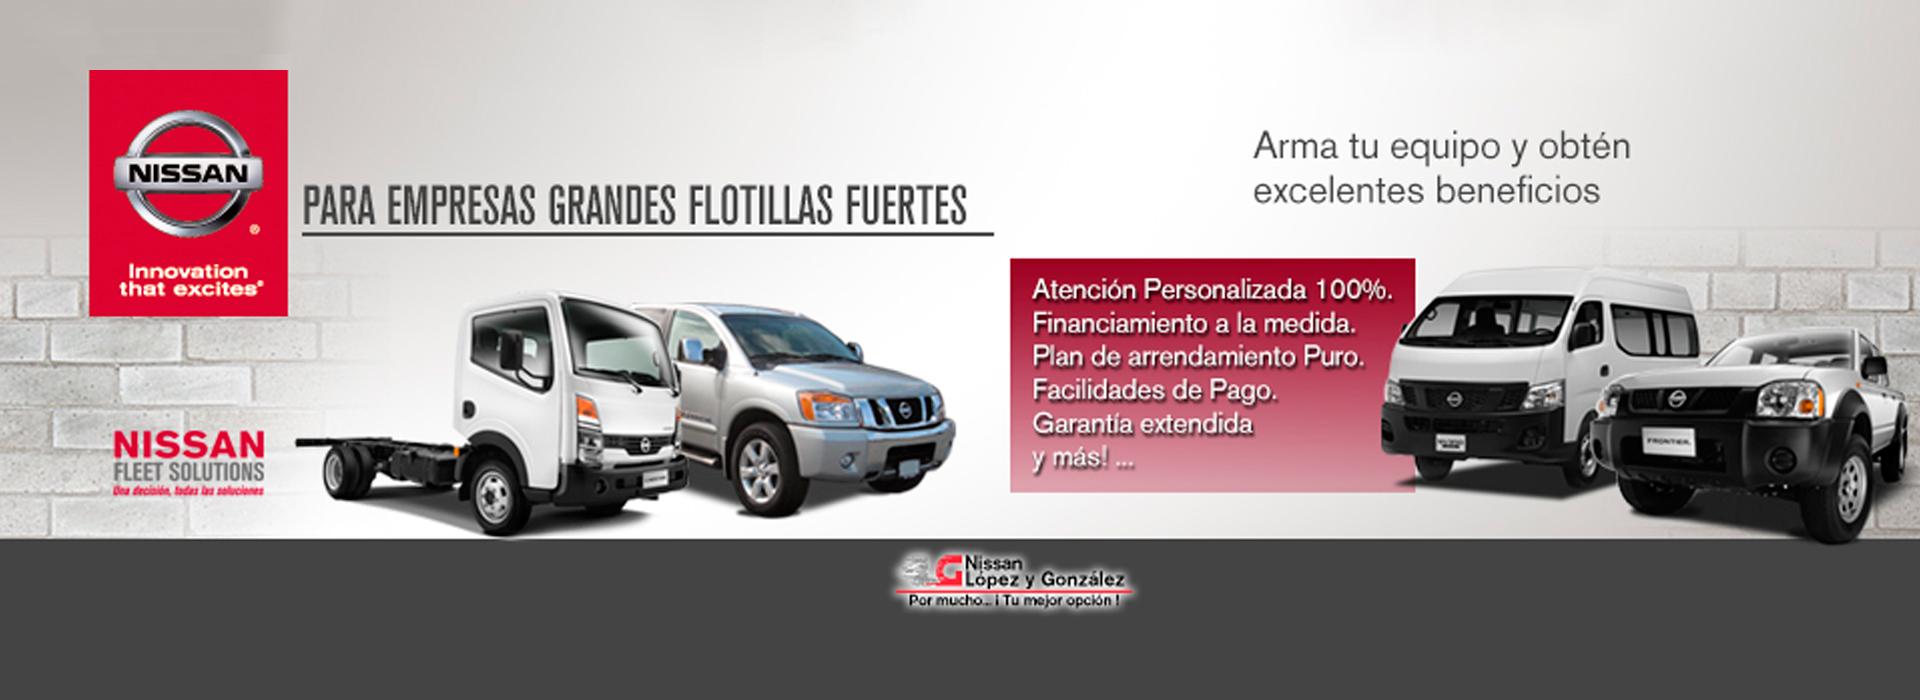 Nissan Fleet Solutions